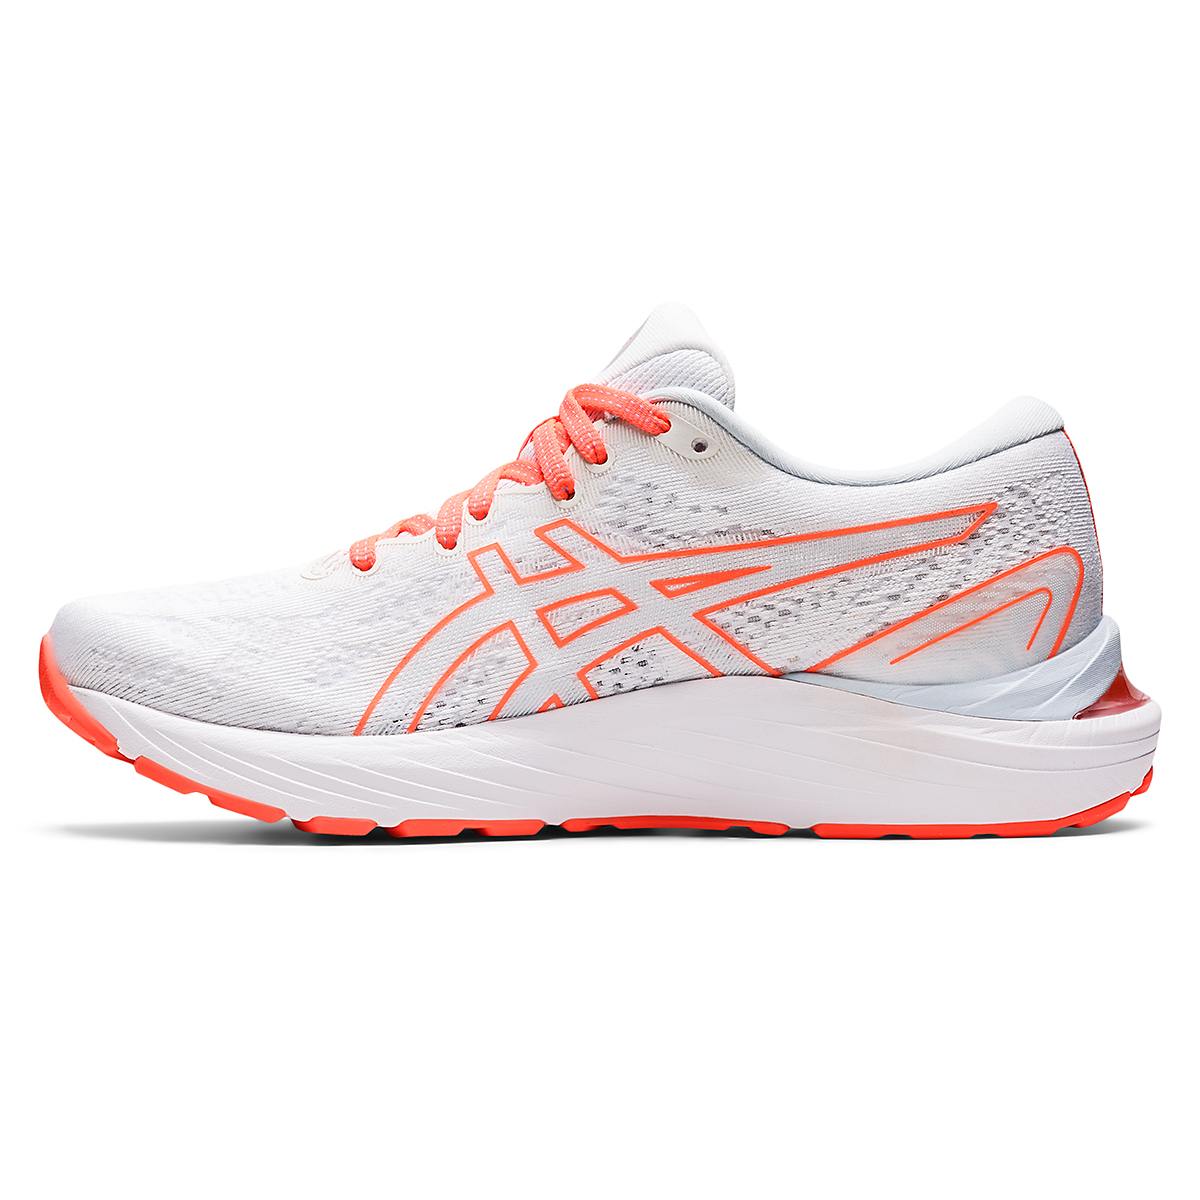 Women's Asics Gel-Cumulus 23 Running Shoe - Color: White/Sky - JackRabbit Exclusive - Size: 5 - Width: Regular, White/Sky - JackRabbit Exclusive, large, image 2